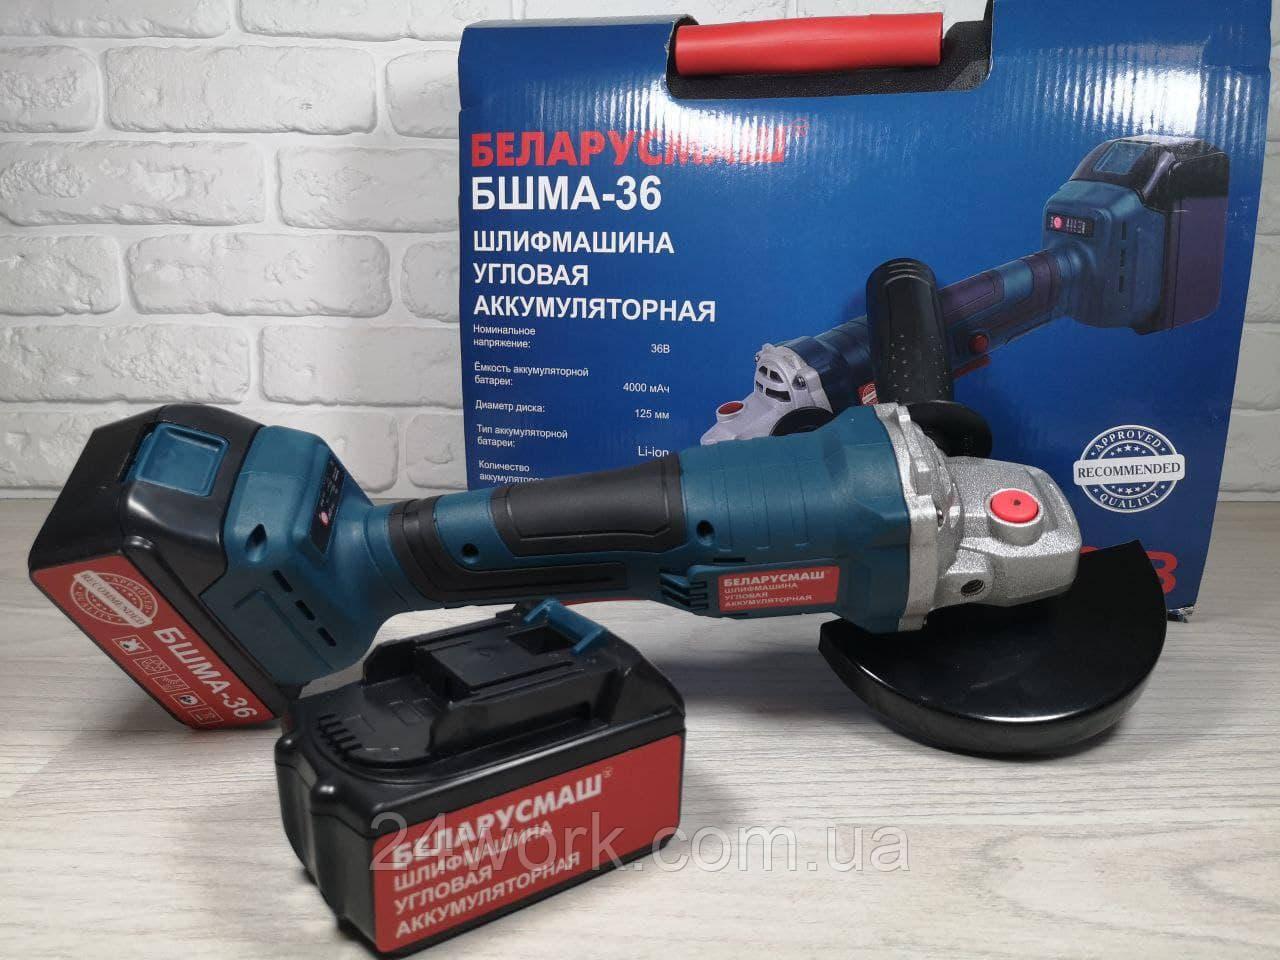 Болгарка аккумуляторная Беларусмаш БШМА-36